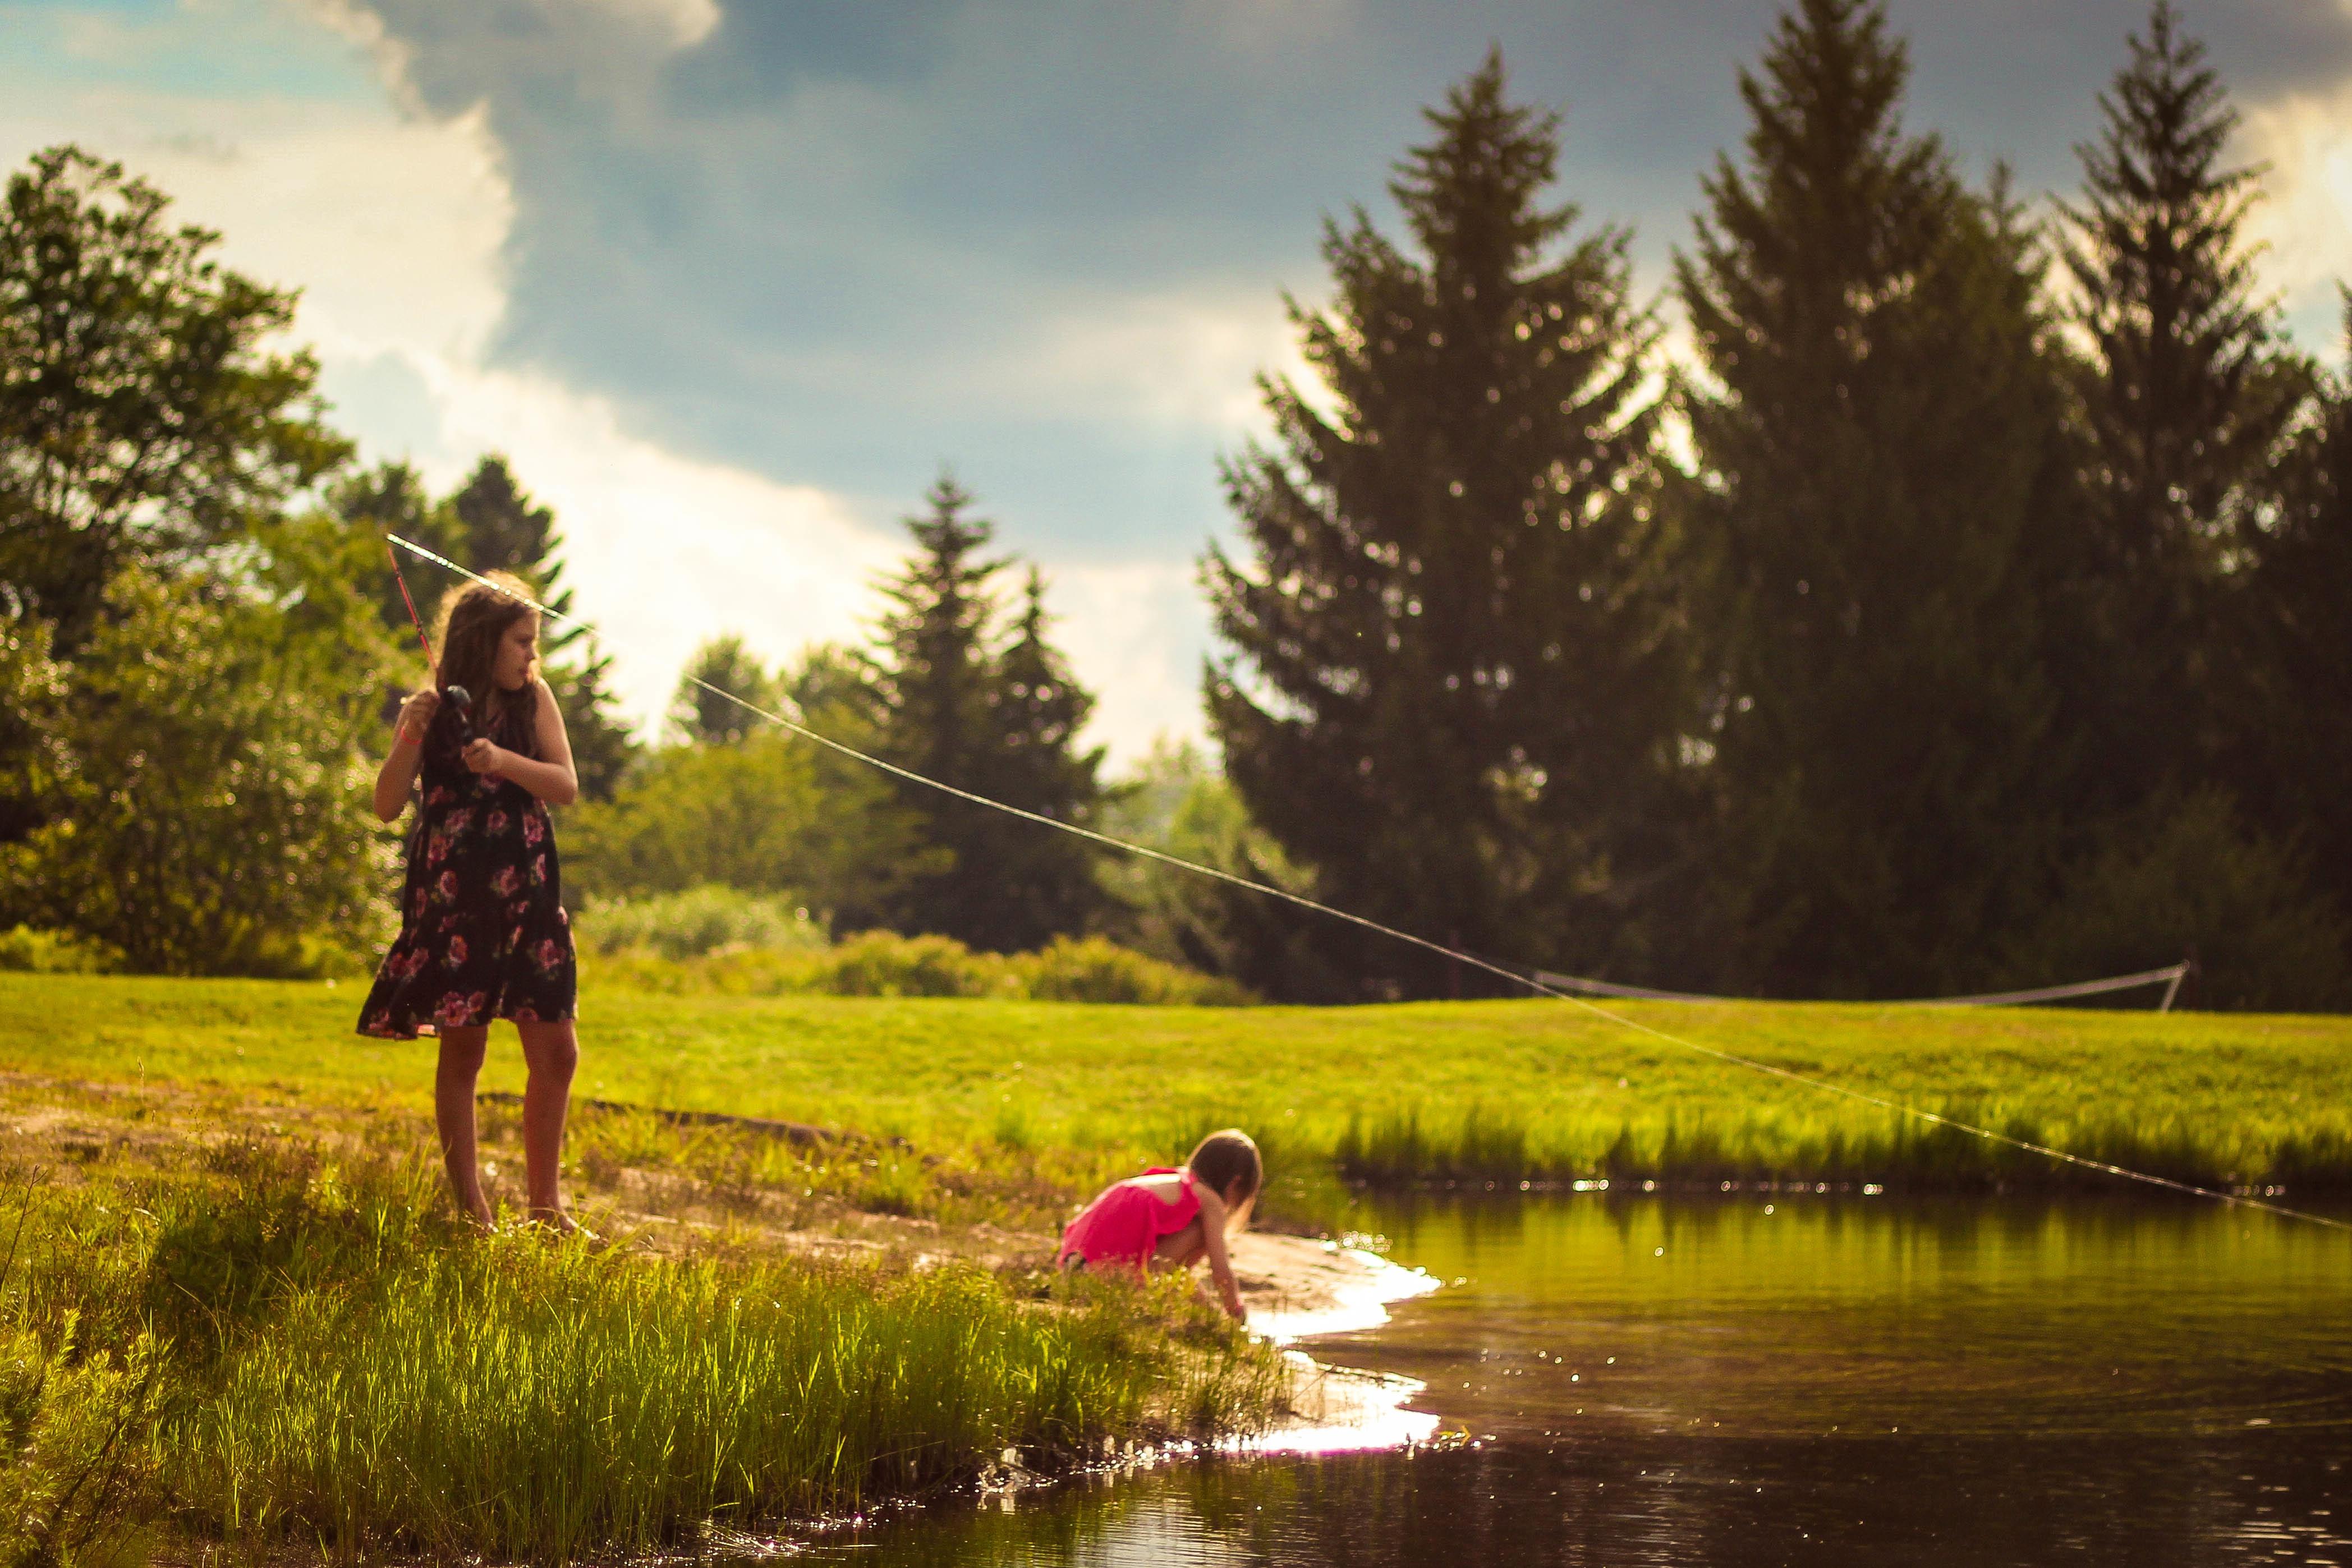 children fishing.jpg